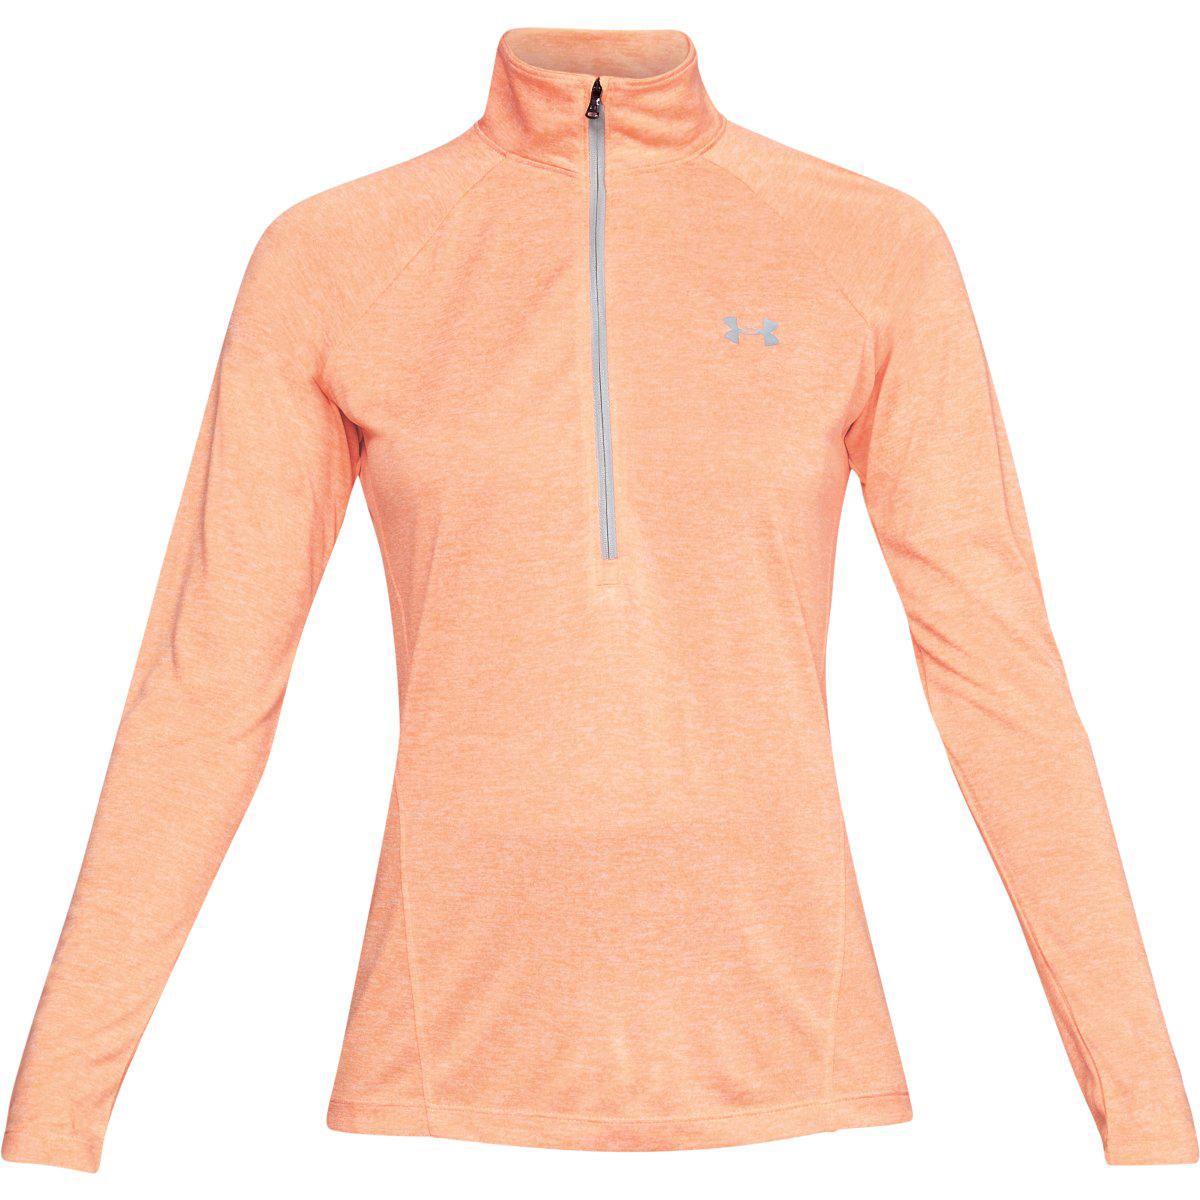 Under Armour Women's Ua Tech Twist Half Zip Pullover - Orange, S